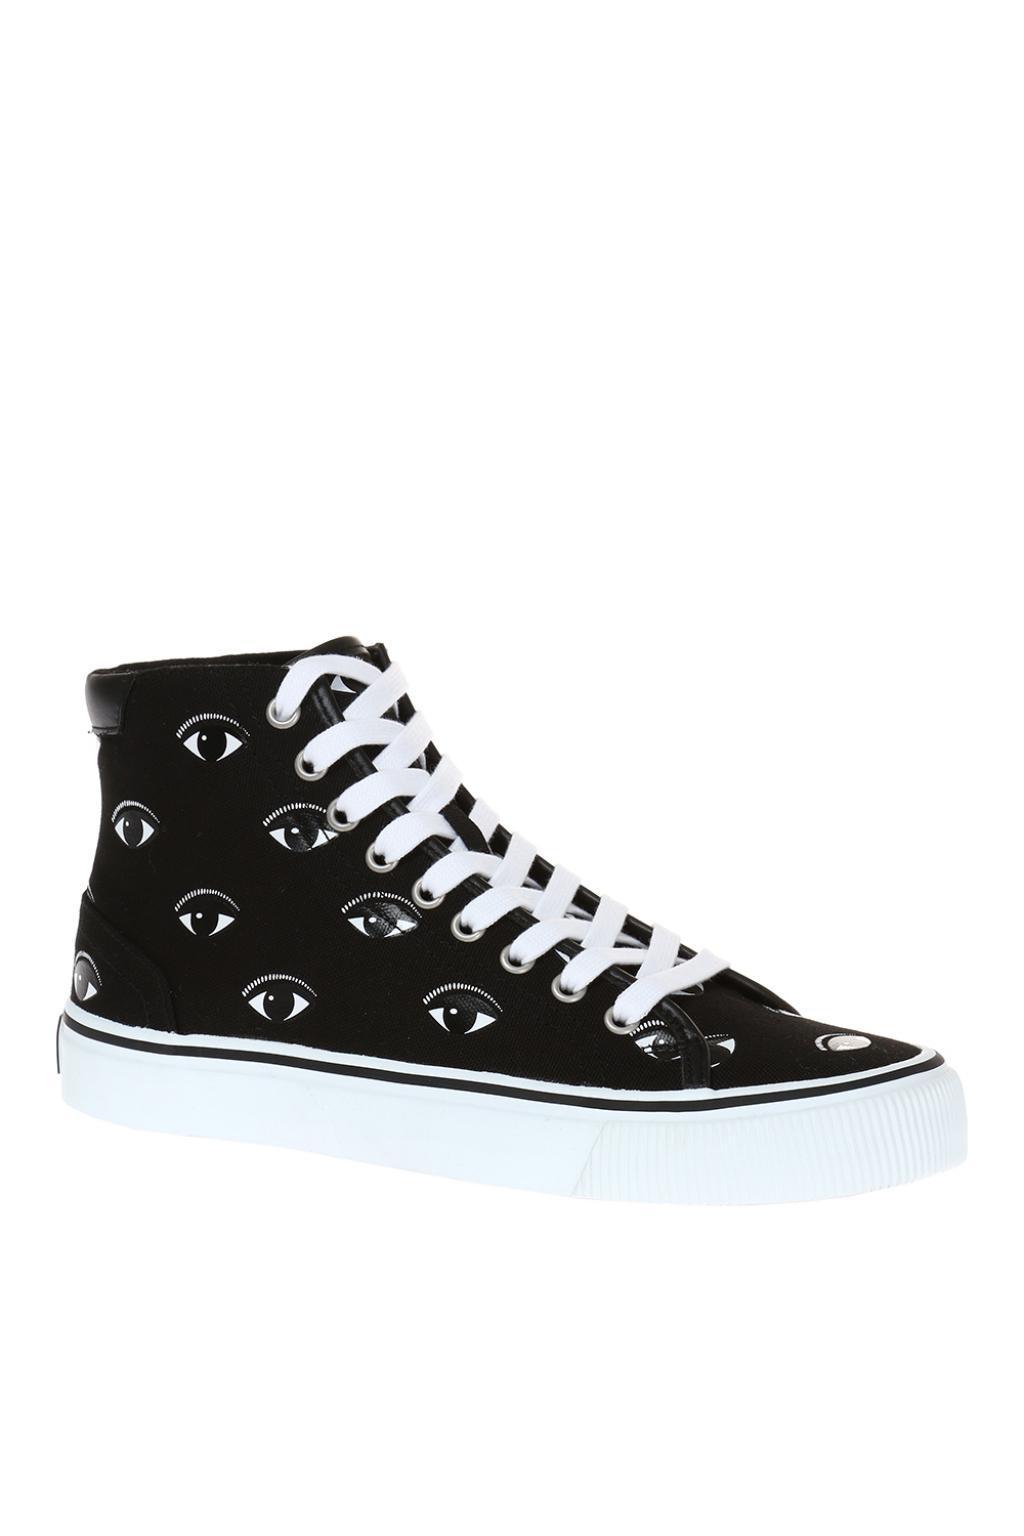 aebca0af KENZO - Black 'vulcano' Patterned High-top Sneakers for Men - Lyst. View  fullscreen